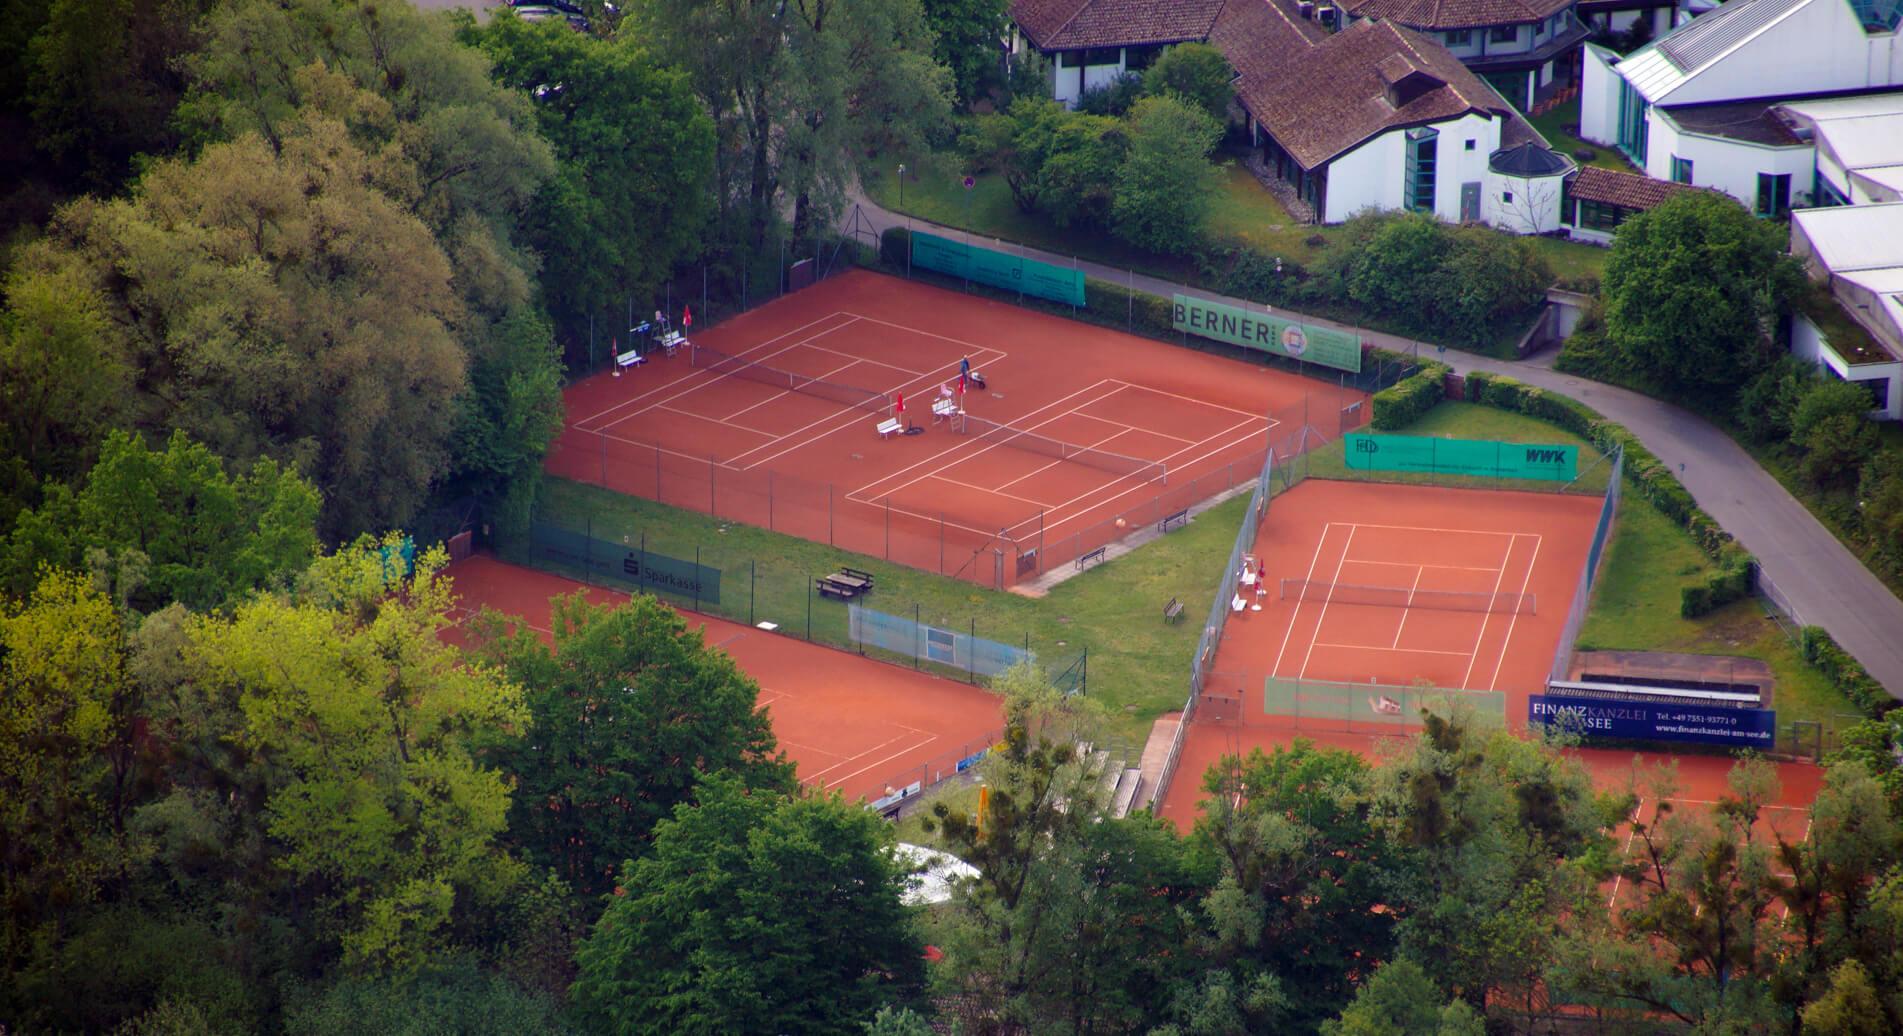 Tennisclub Radolfzell